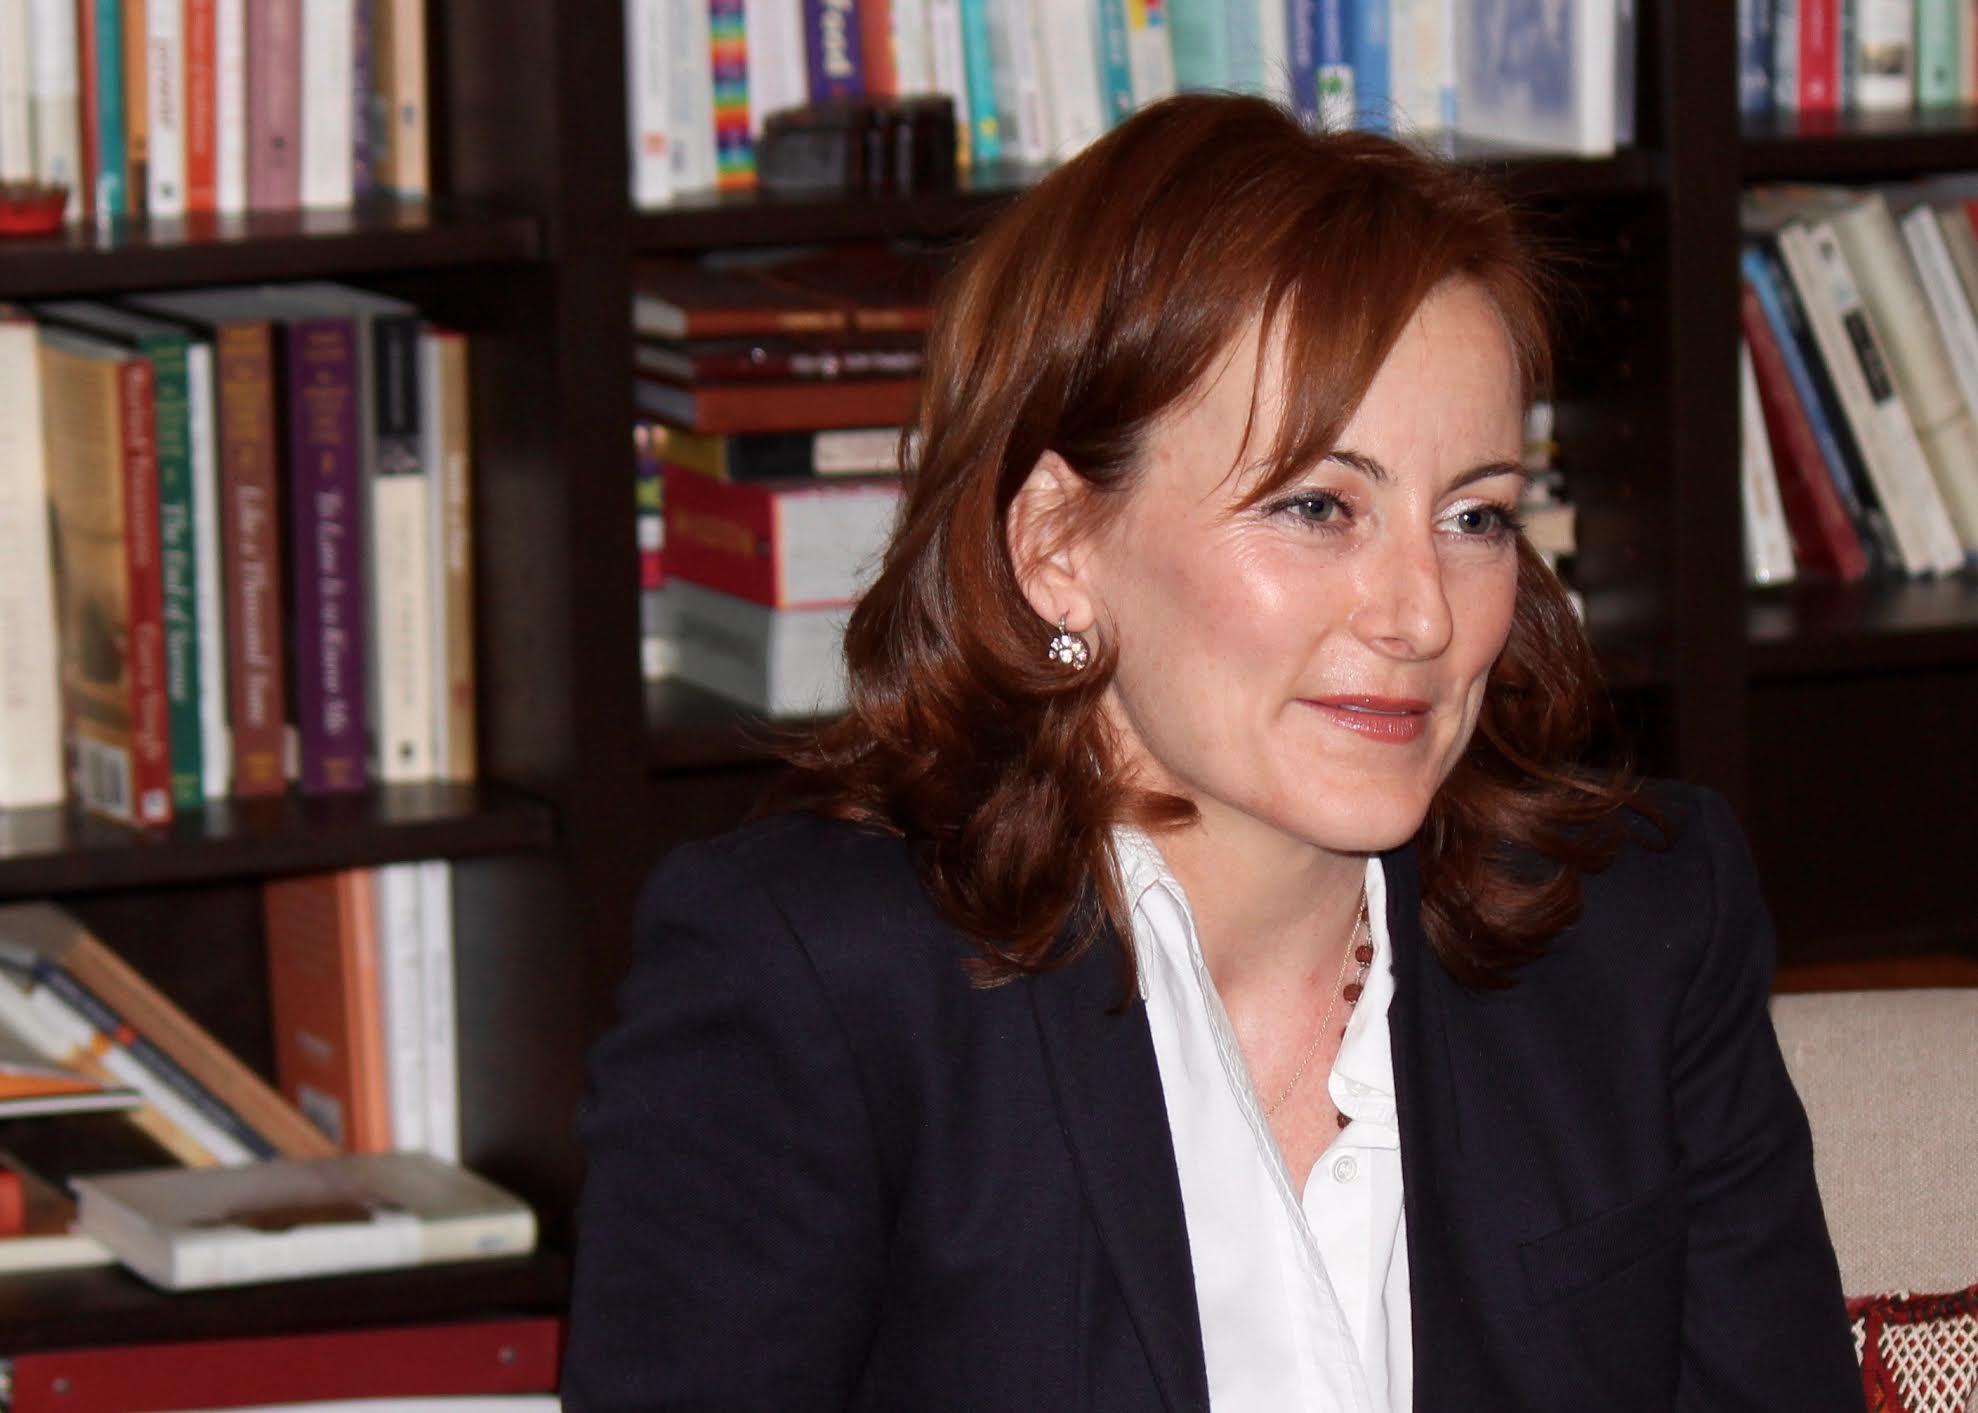 Katrina Dornig, PhD, Counselor, Therapist, Los Angeles